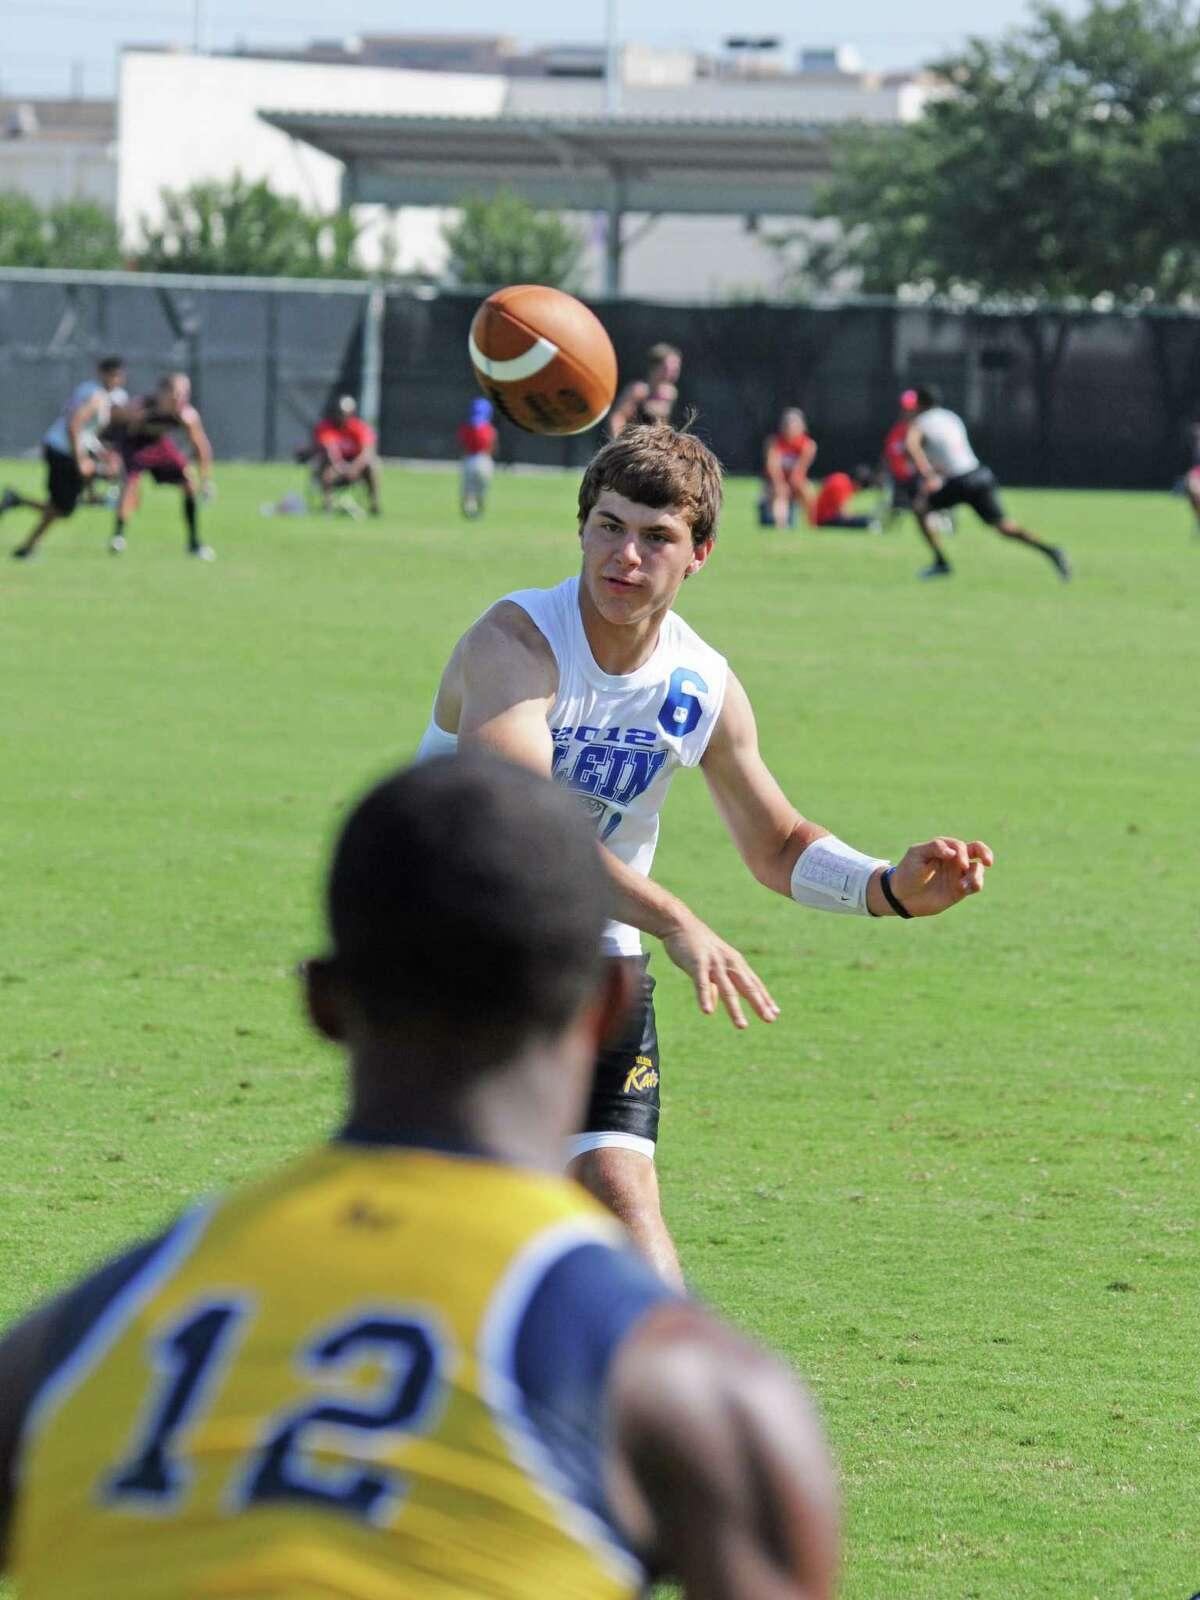 Klein junior quarterback Rainer Ausmus (6) has been impressive during the Beakats' 1-1 start to the 2012 season.